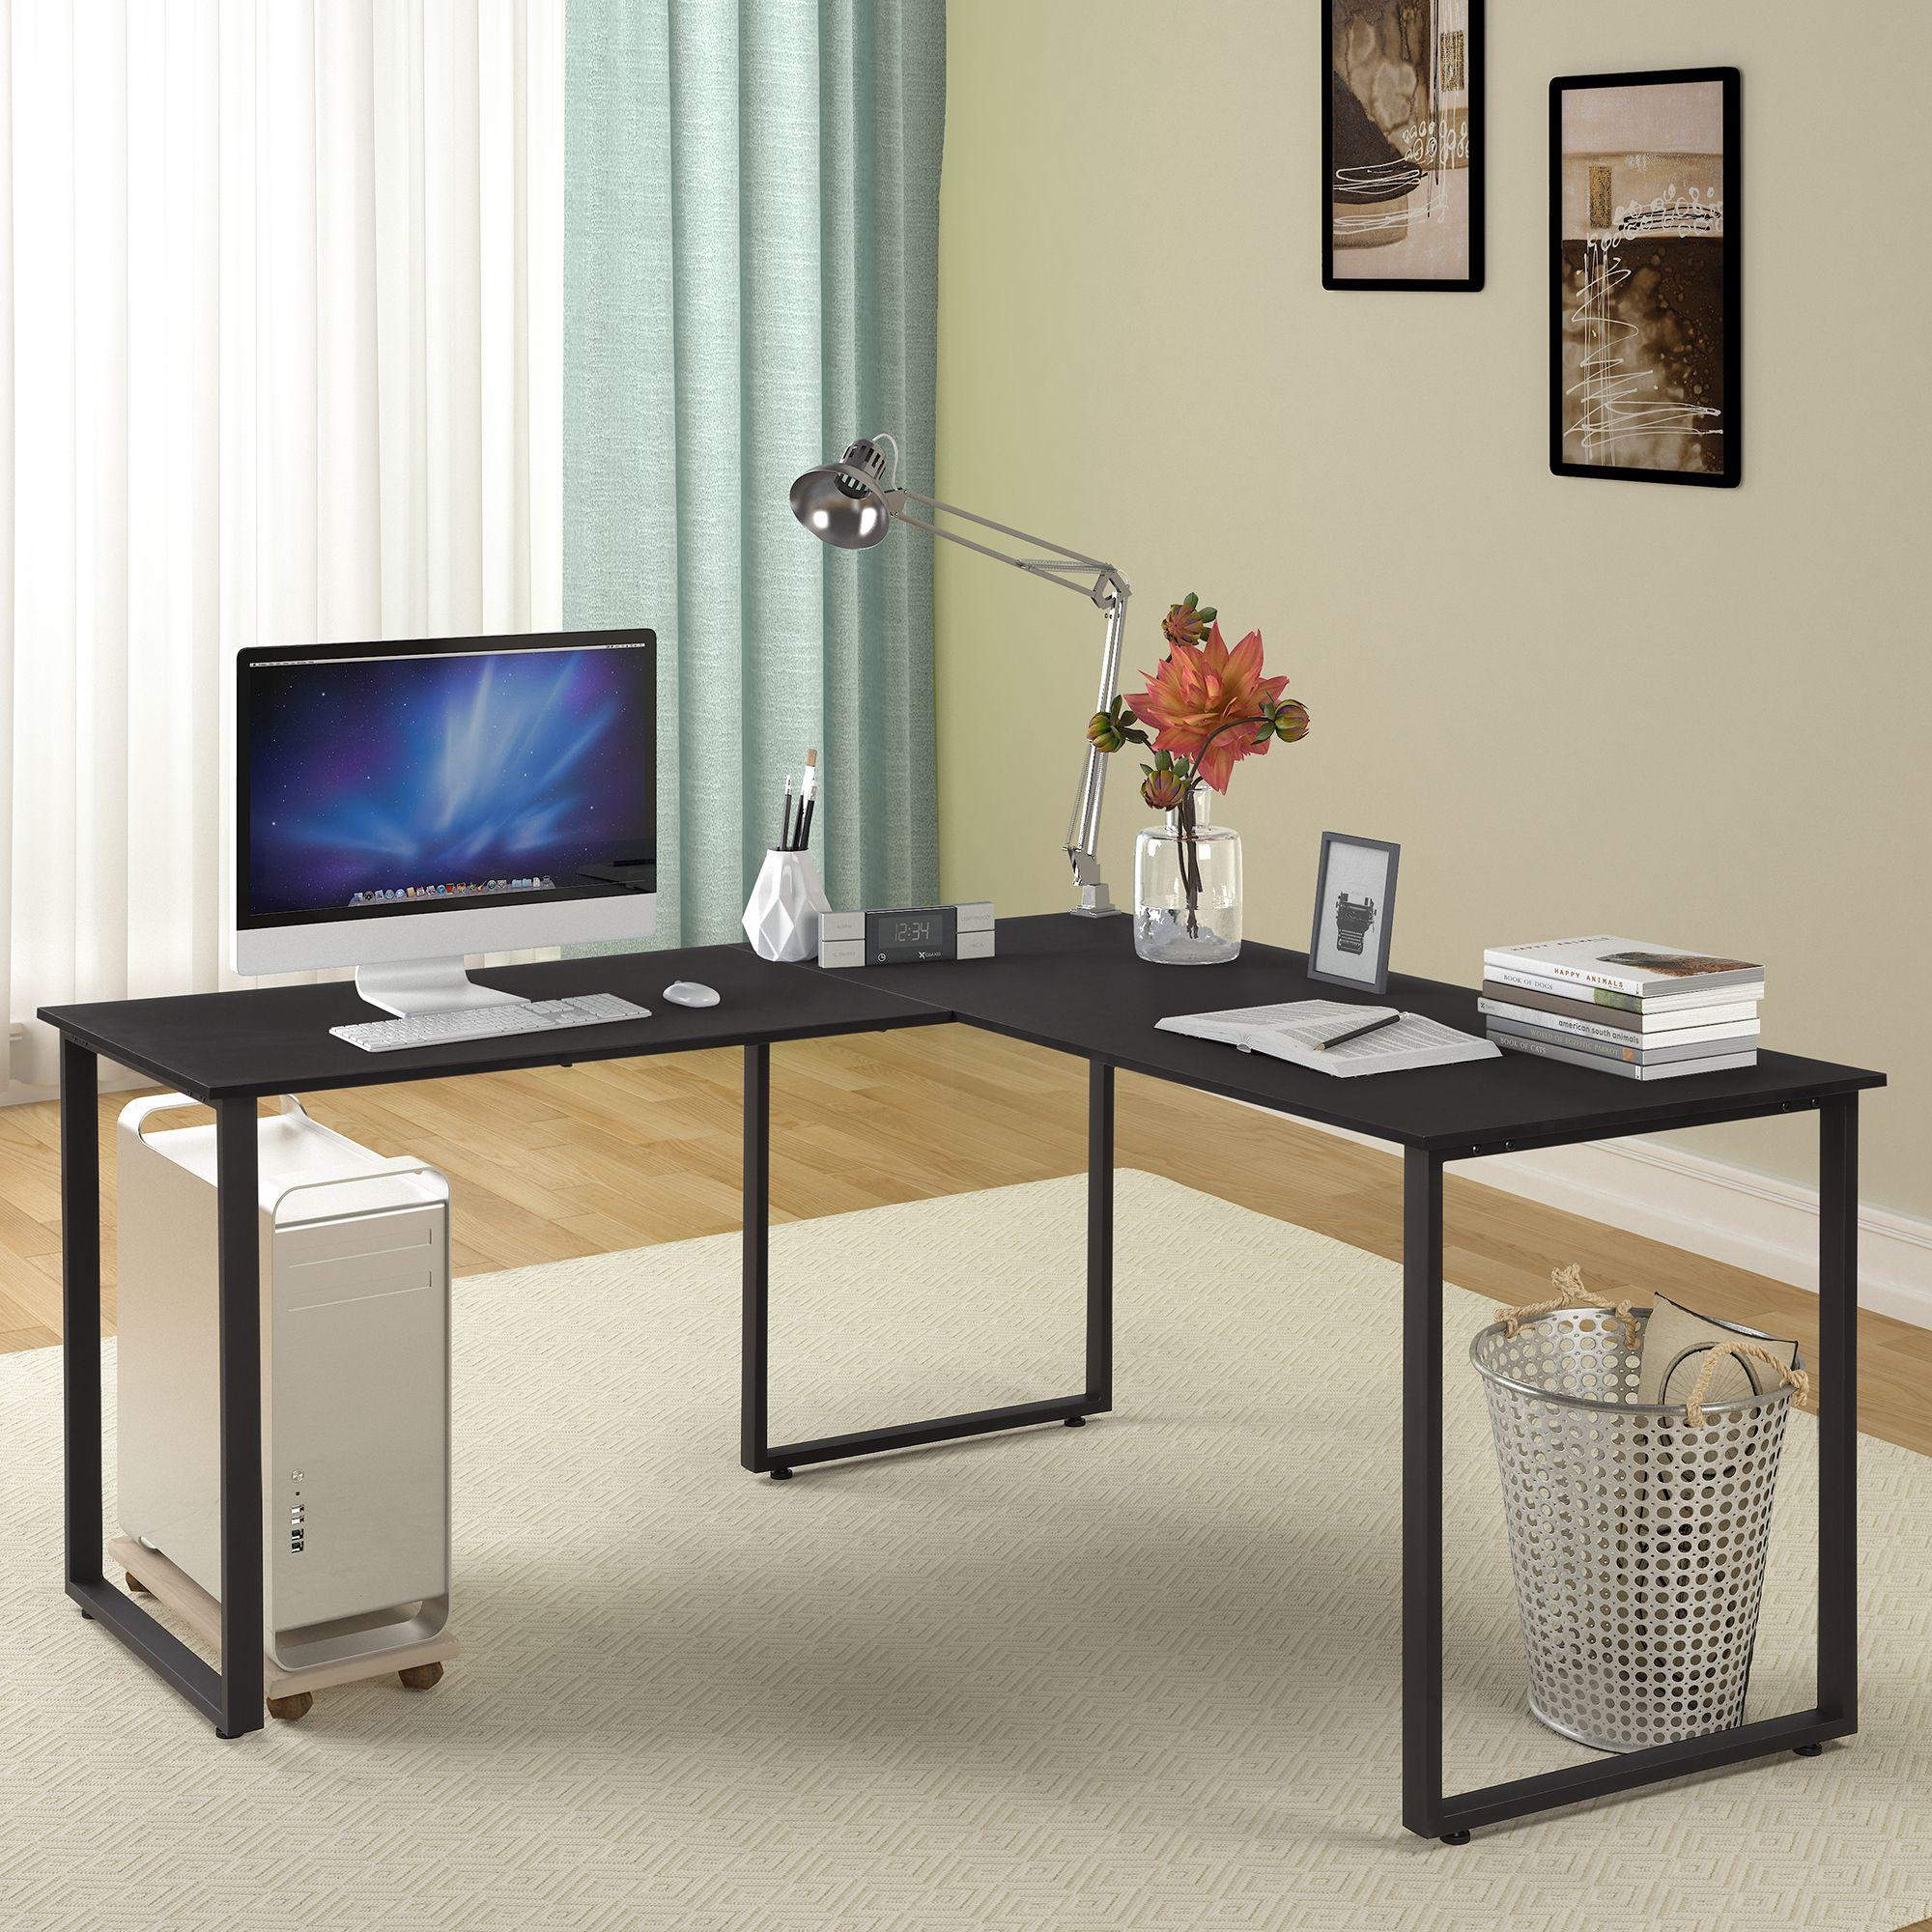 Merax 59 L Shaped Desk With Metal Legs Office Desk Corner Computer Desk Pc Laptop Table Workstation Ad Desk Ad Pc Desk Corner Computer Desk L Shaped Desk